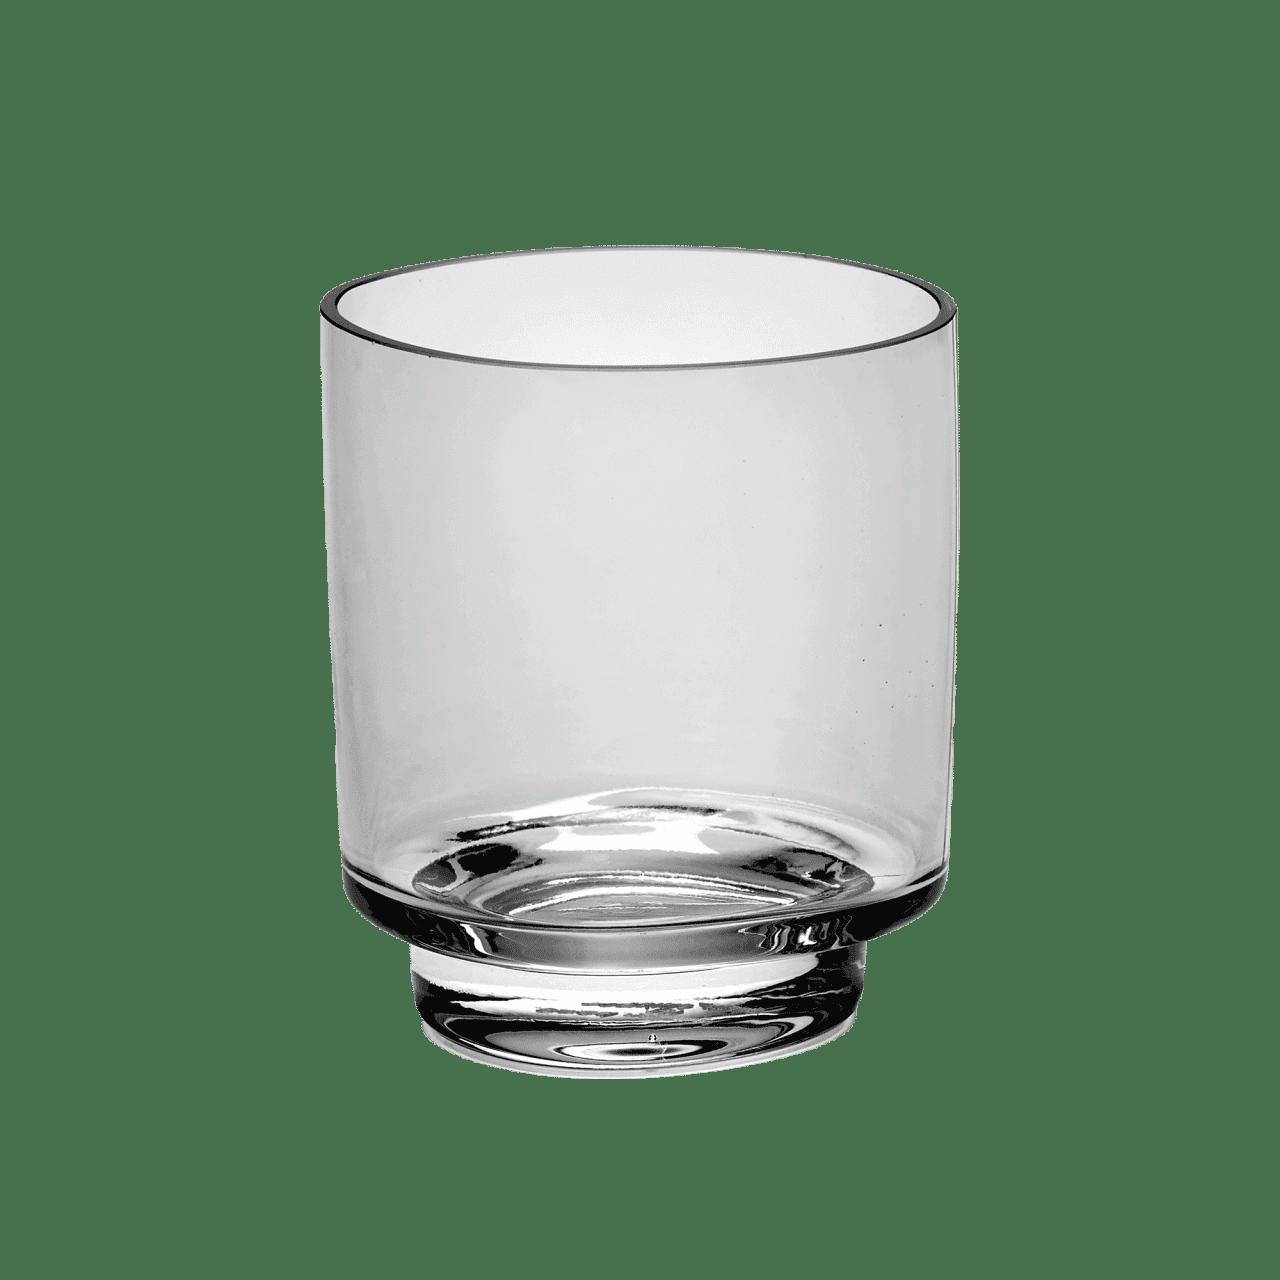 Maarten Baas Tumbler Glas Viererset